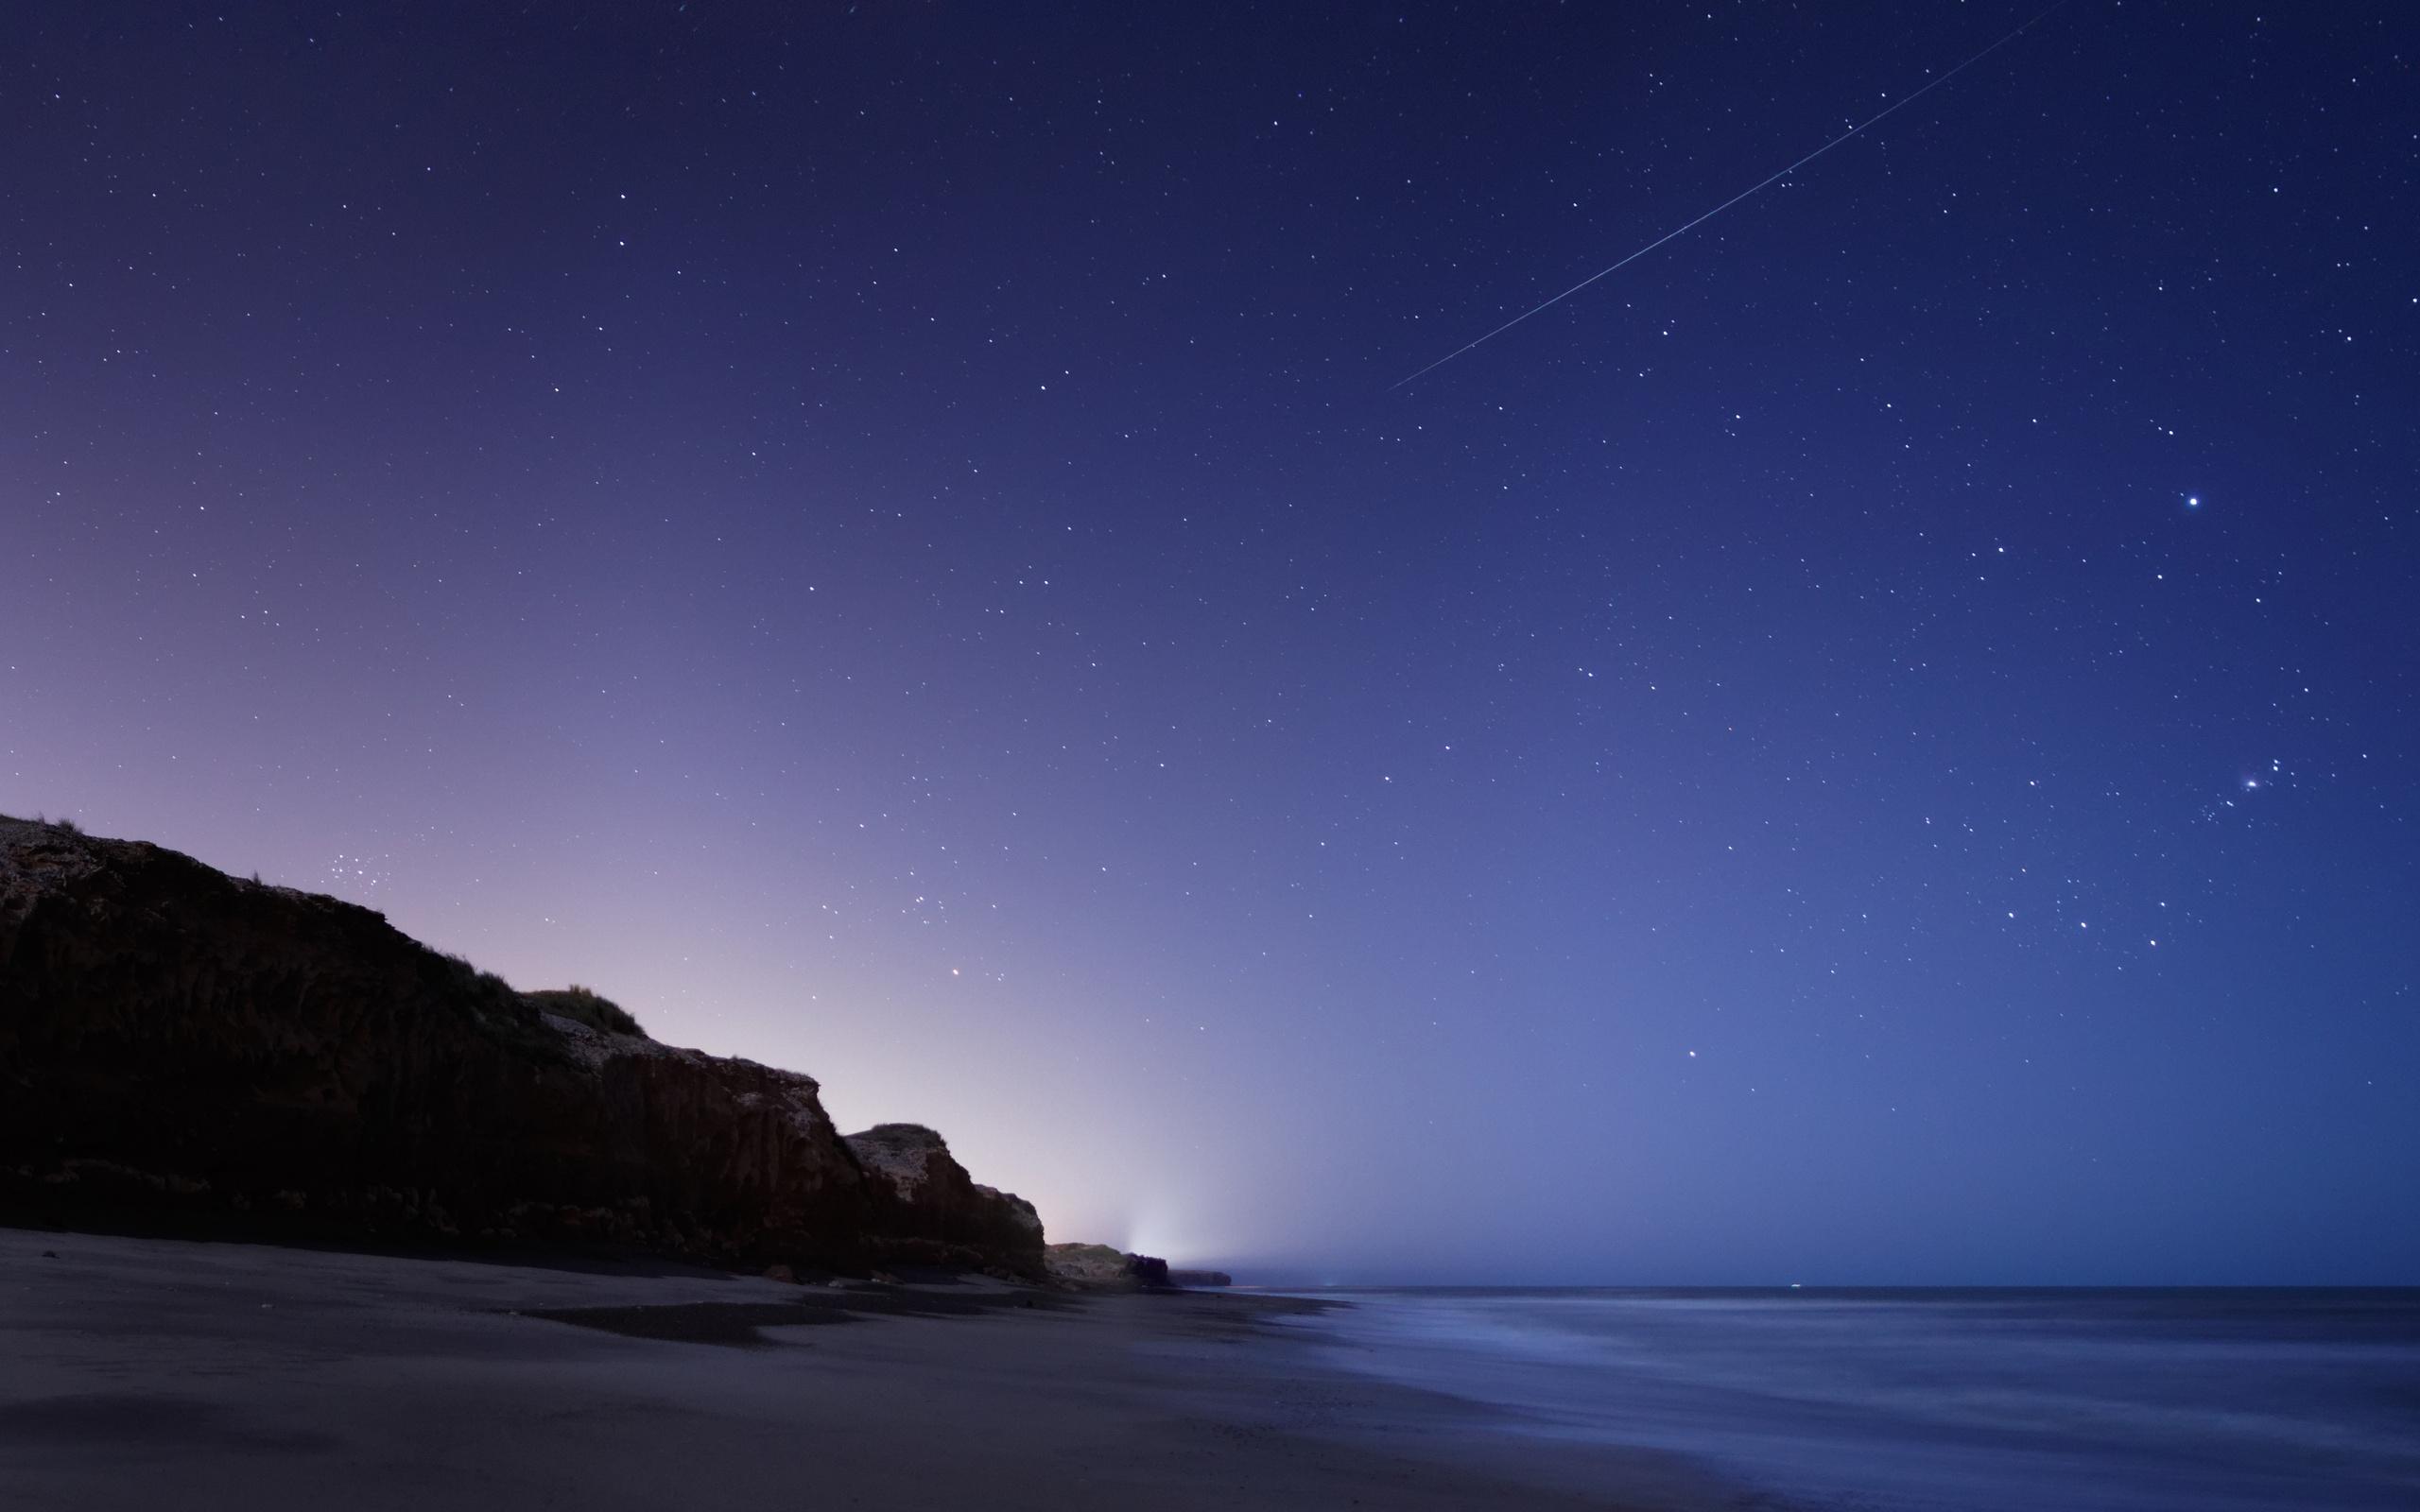 Stars Night Twilight The Sky Falling Sea Rock